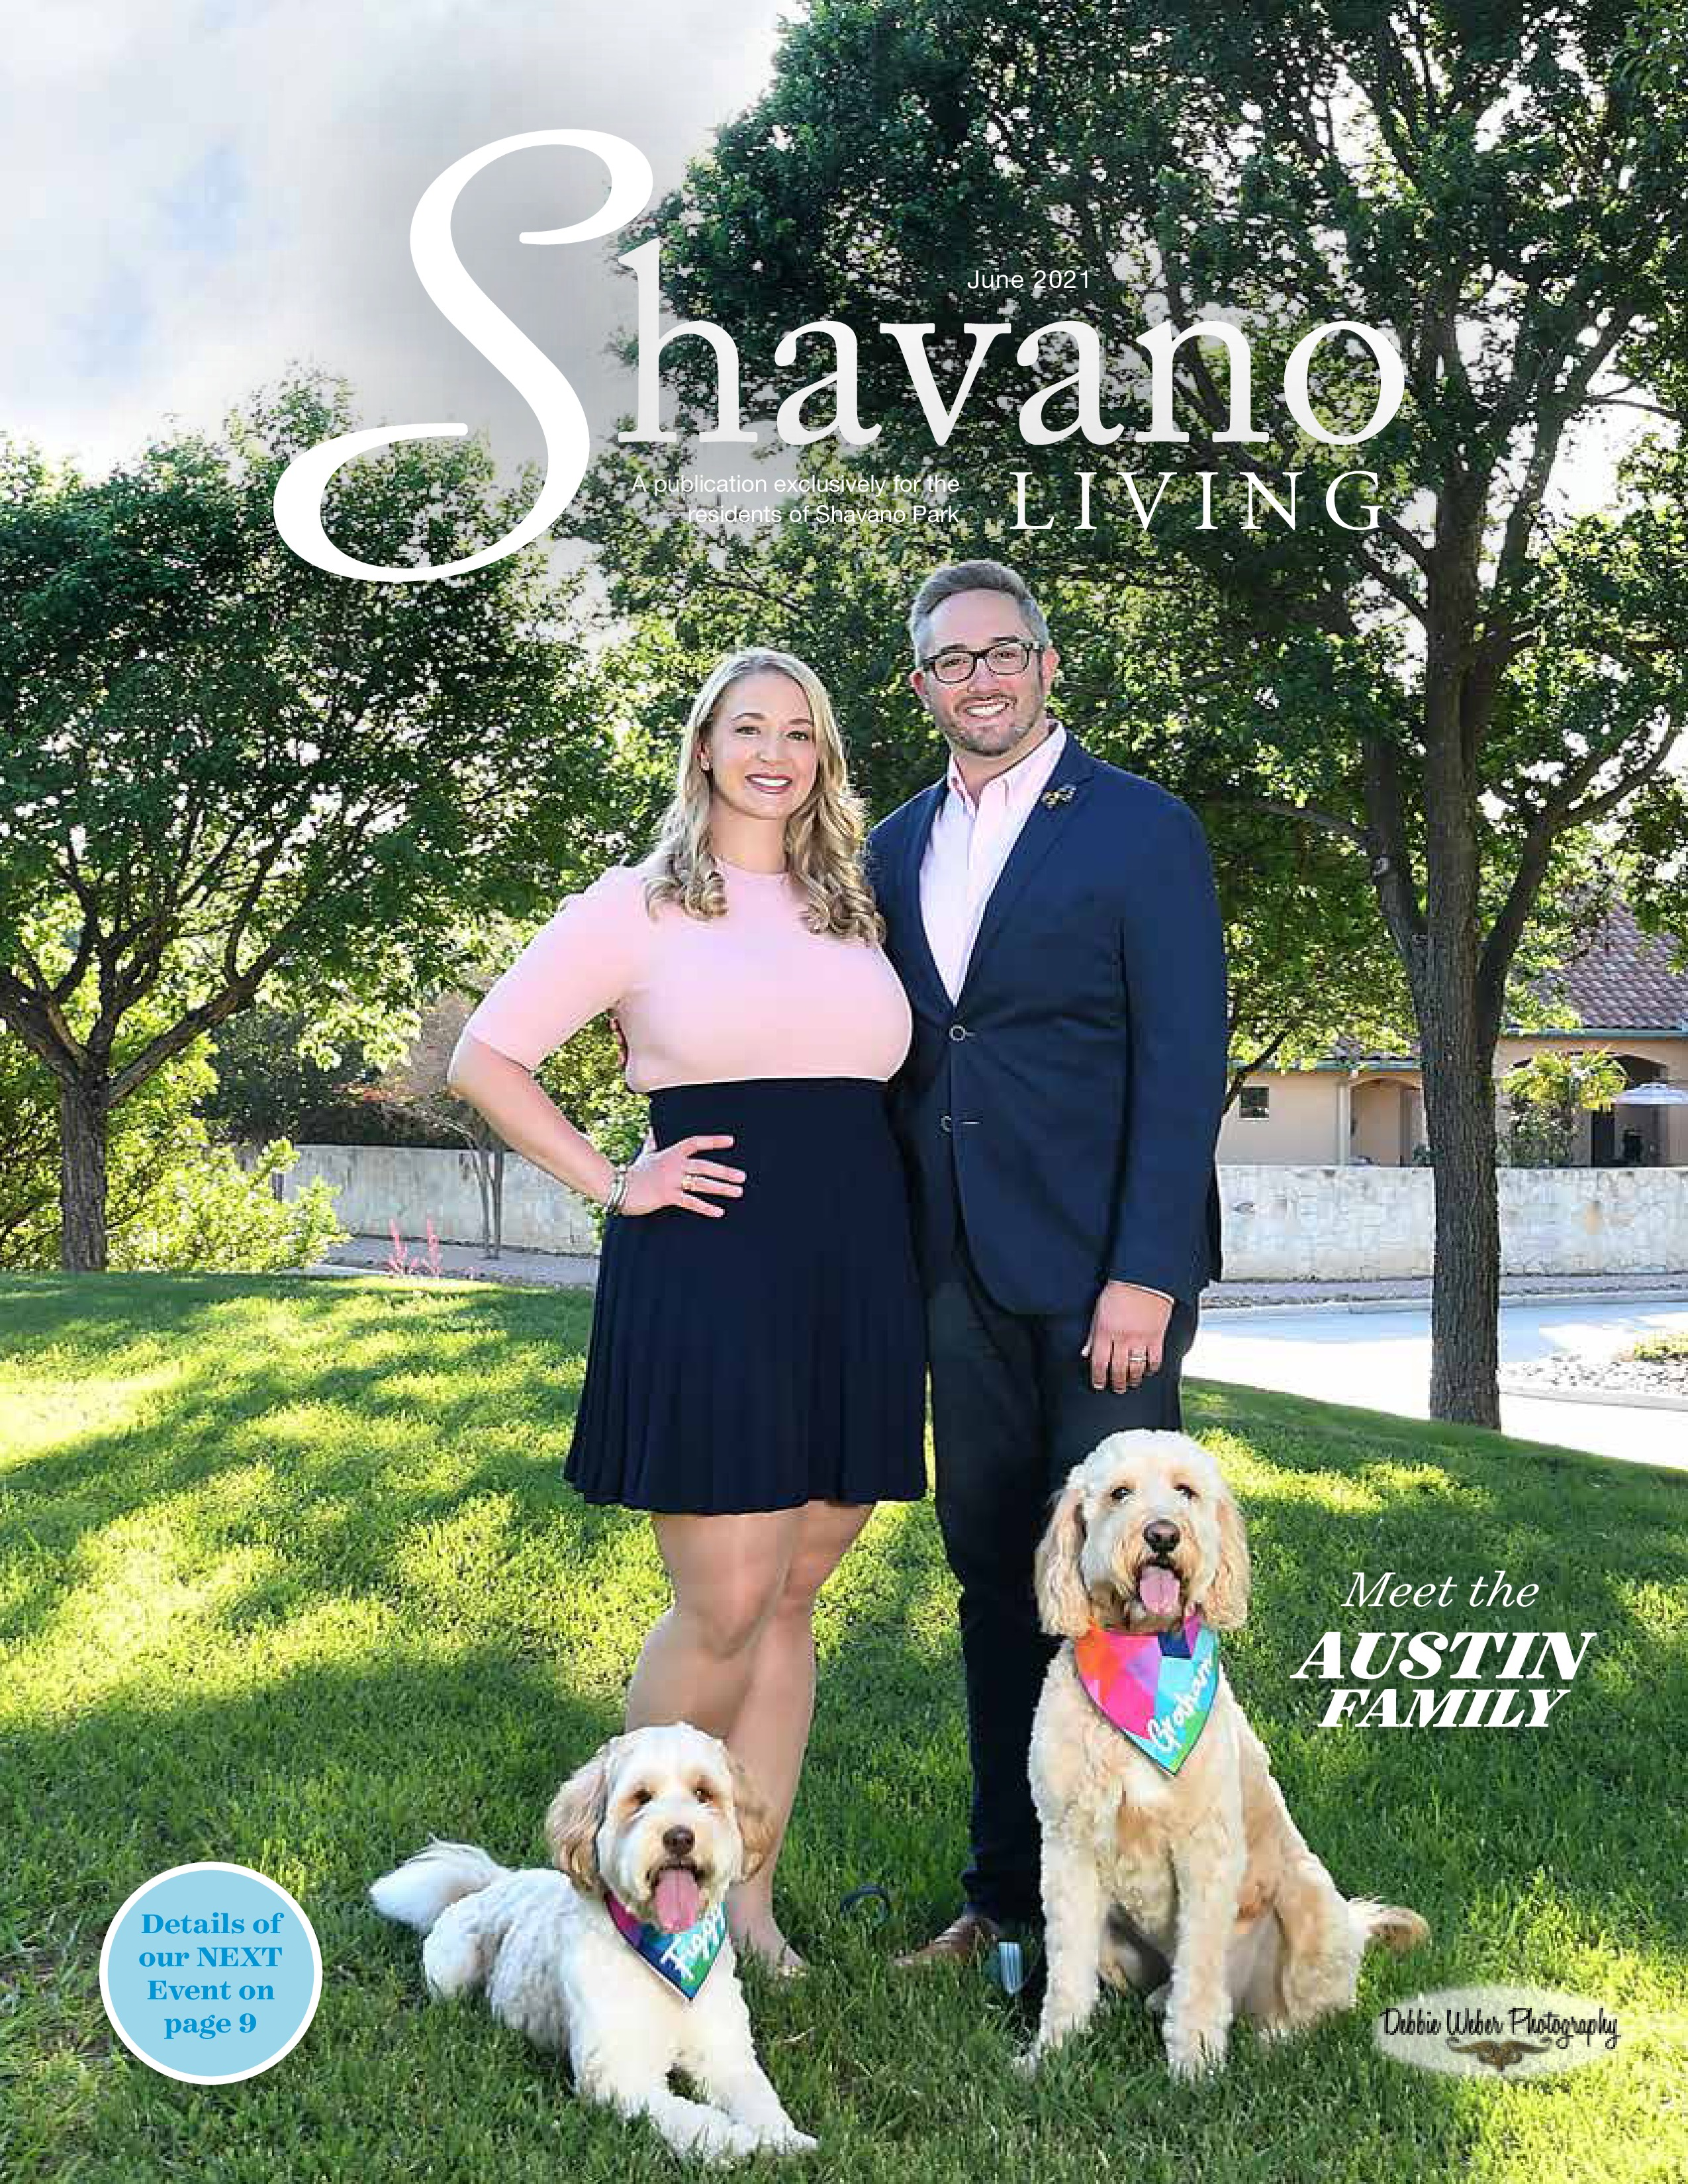 Shavano Living 2021-06-01